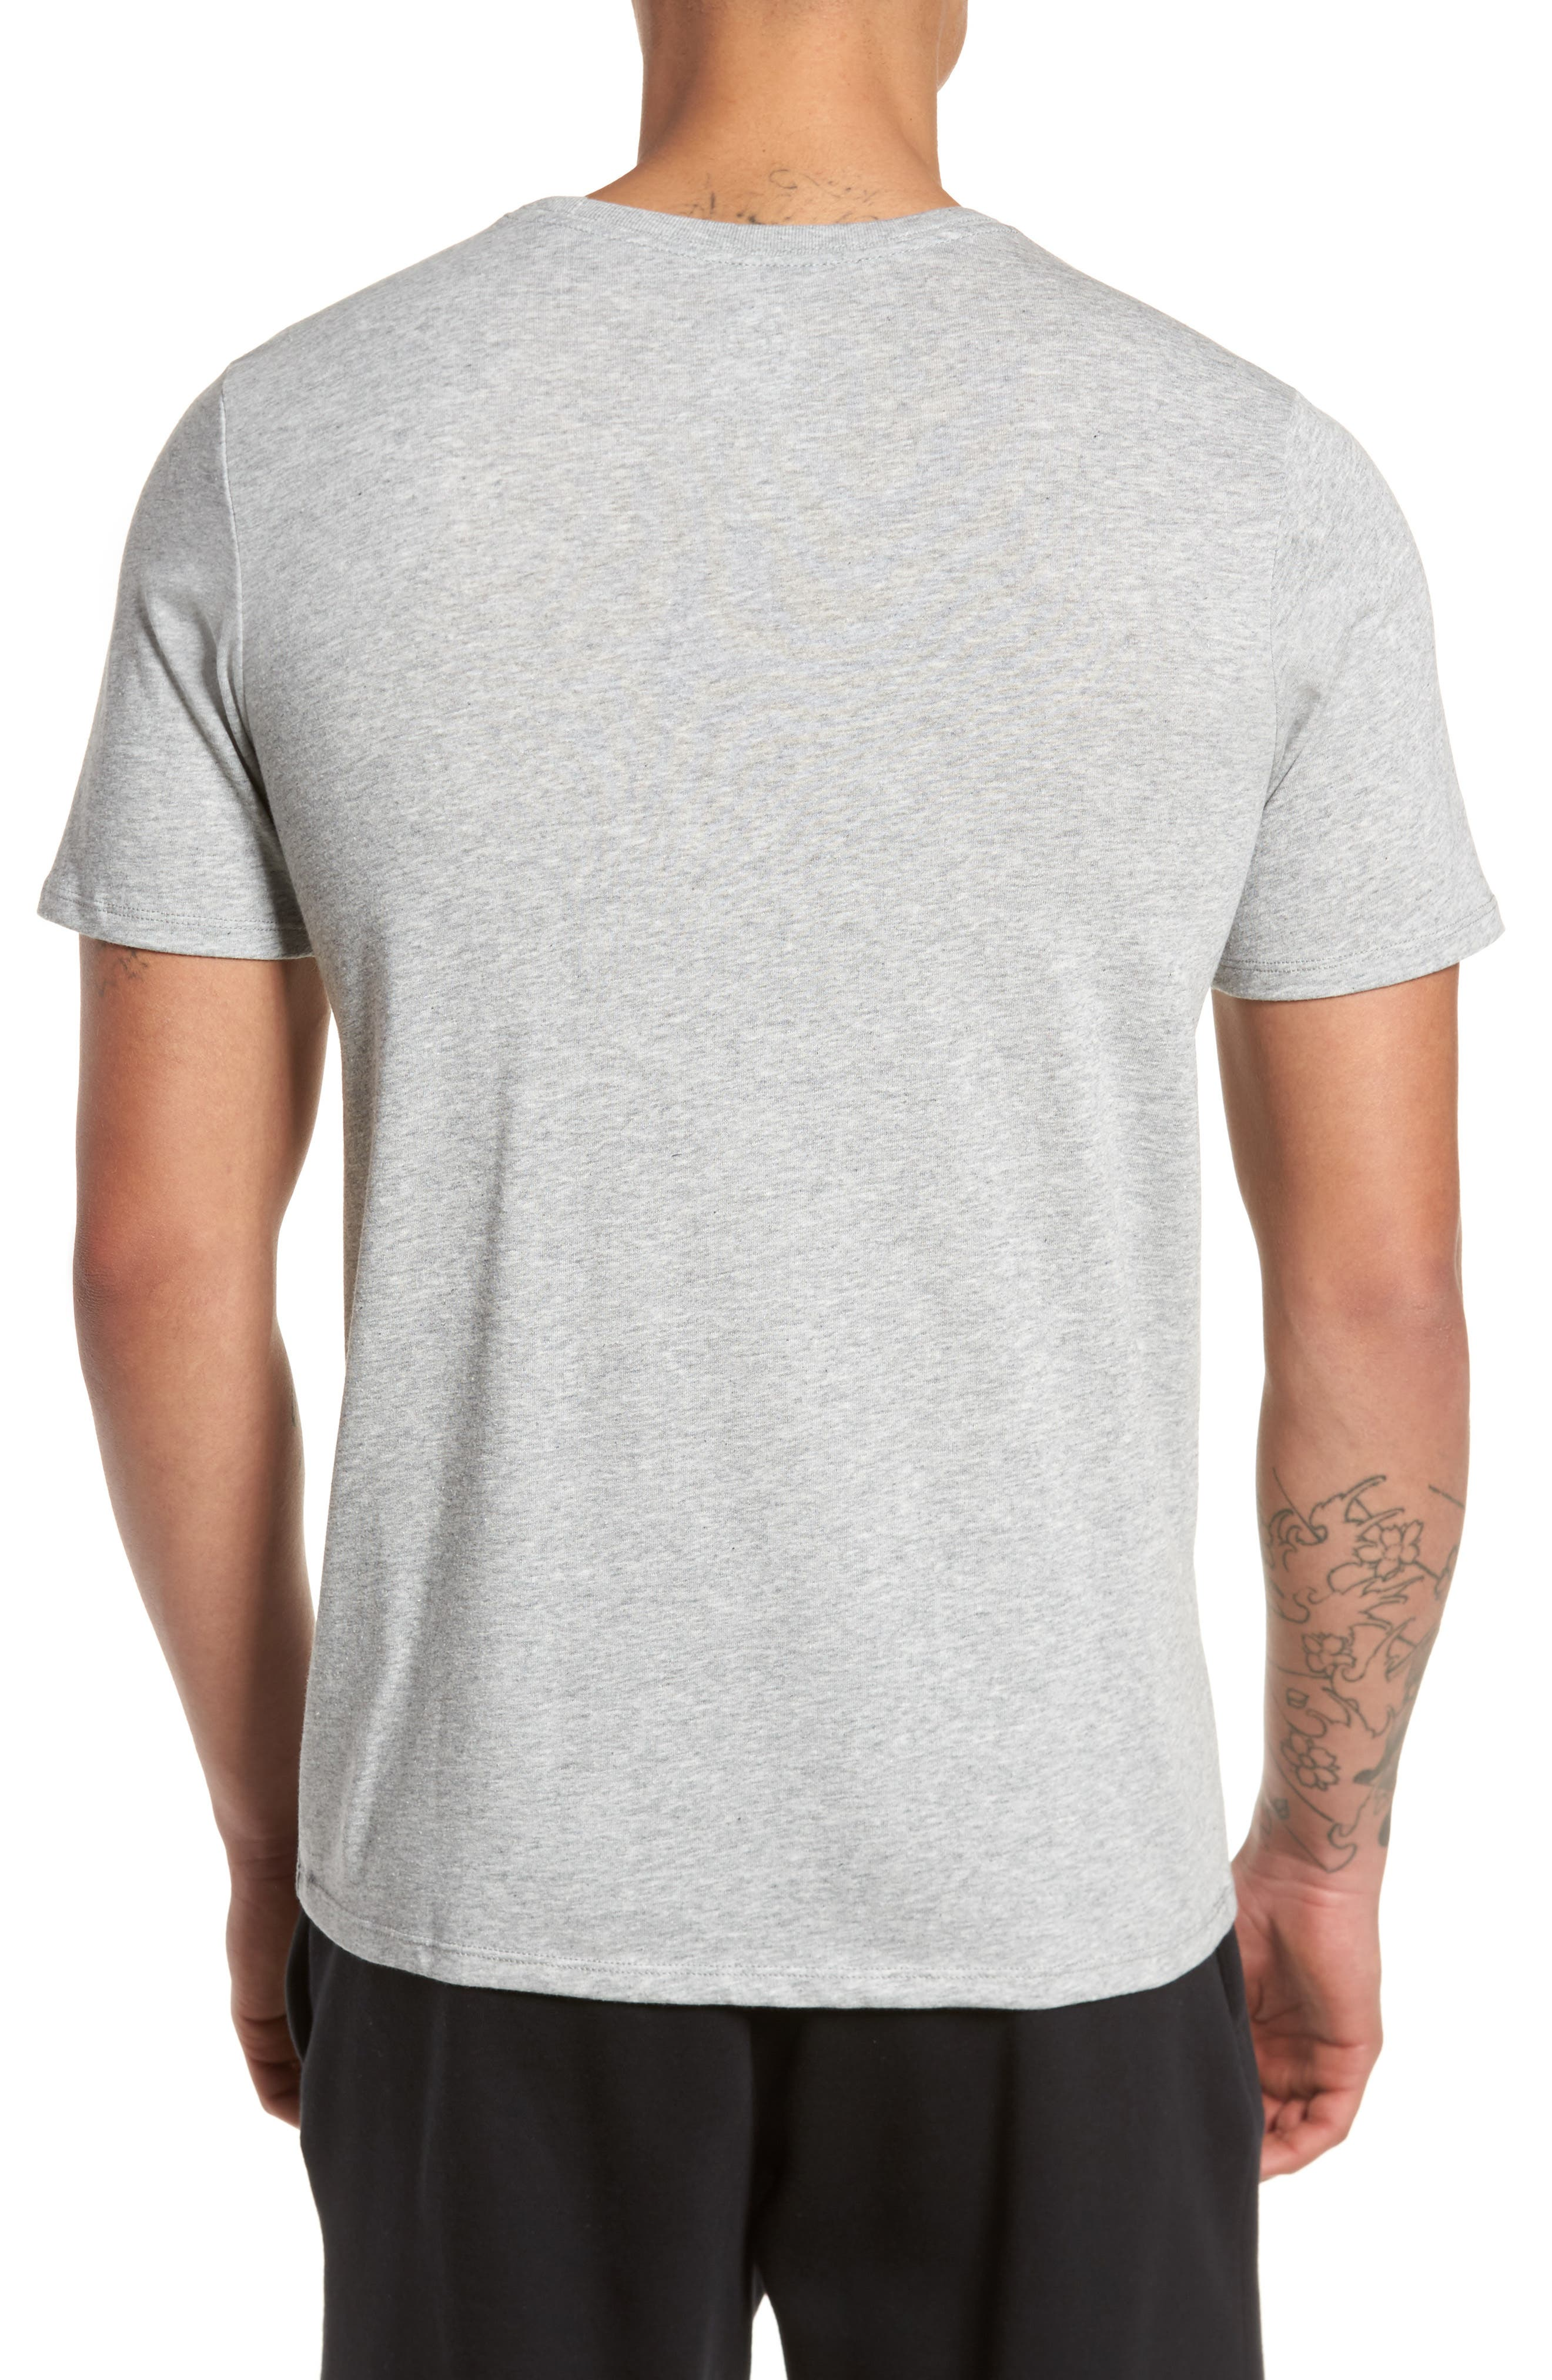 Dry Swooshie Crewneck T-Shirt,                             Alternate thumbnail 2, color,                             Dark Grey Heather/ Black